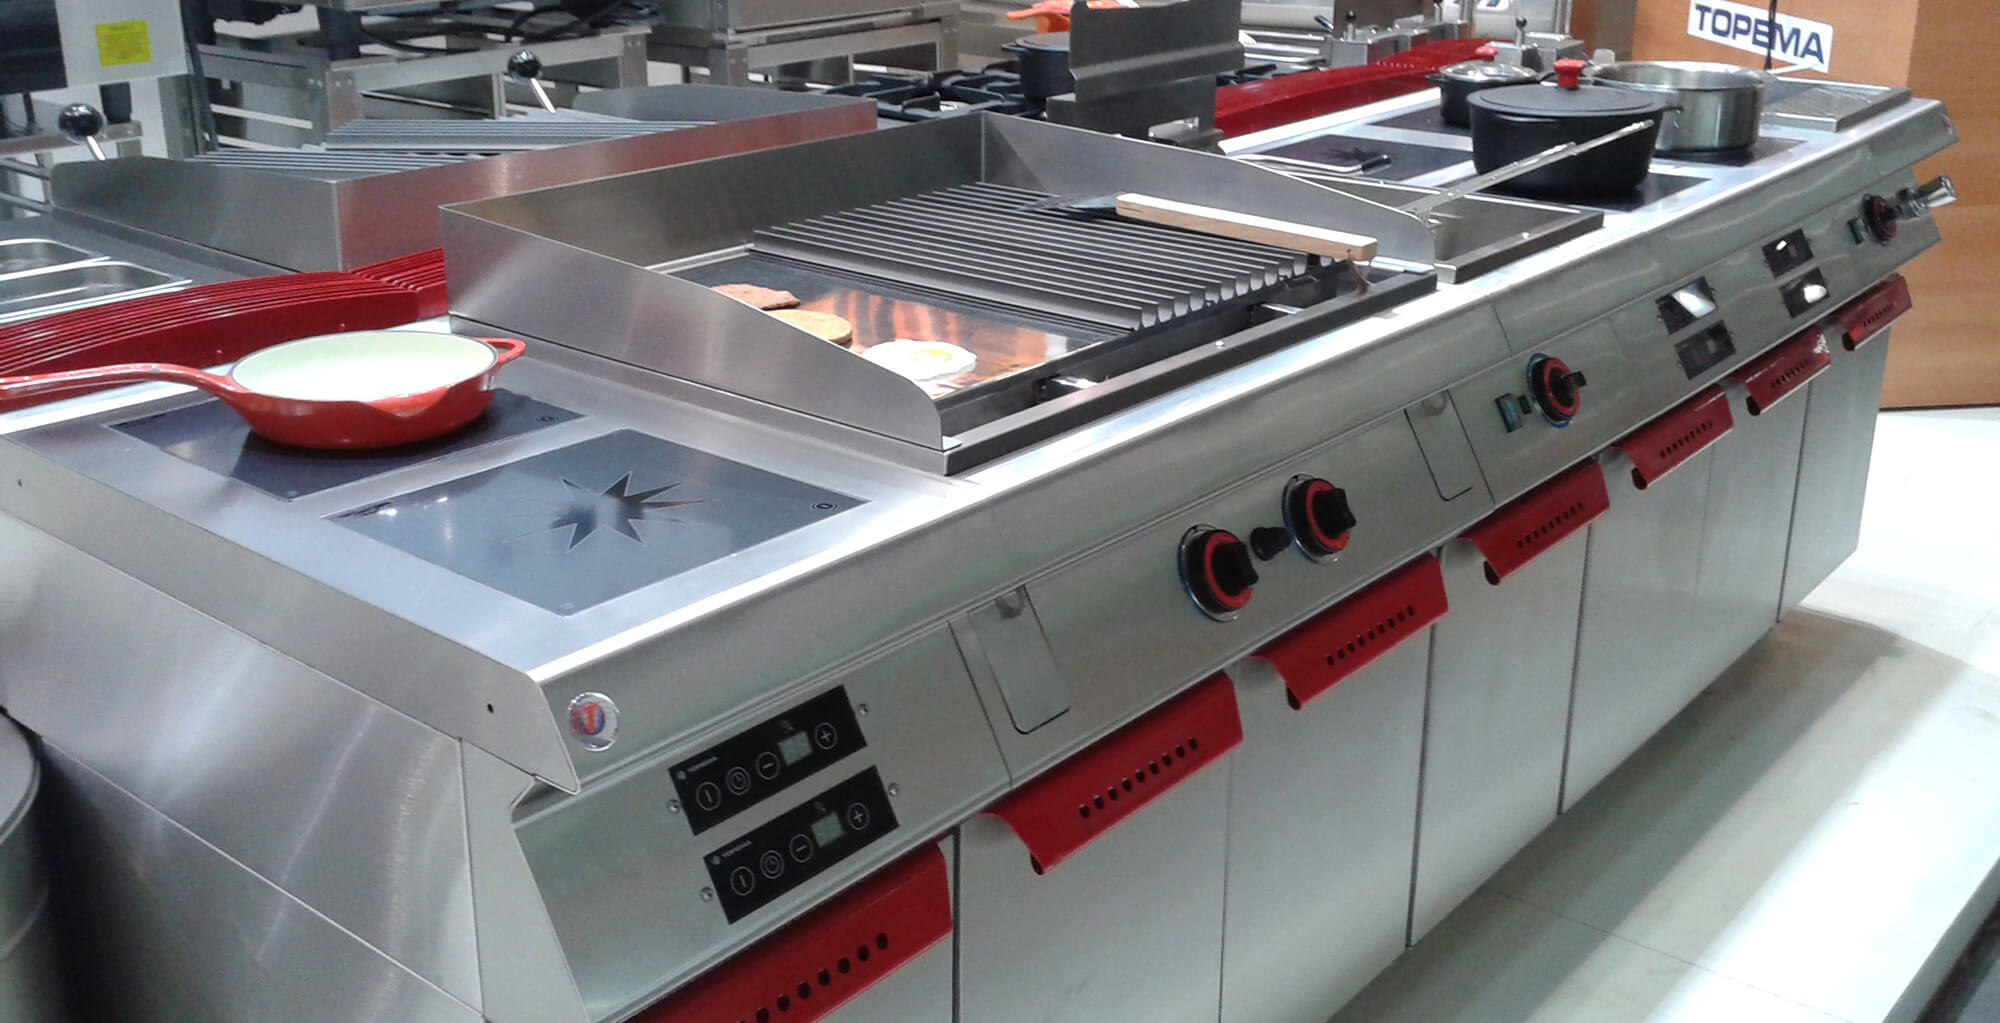 montar cozinha industrial